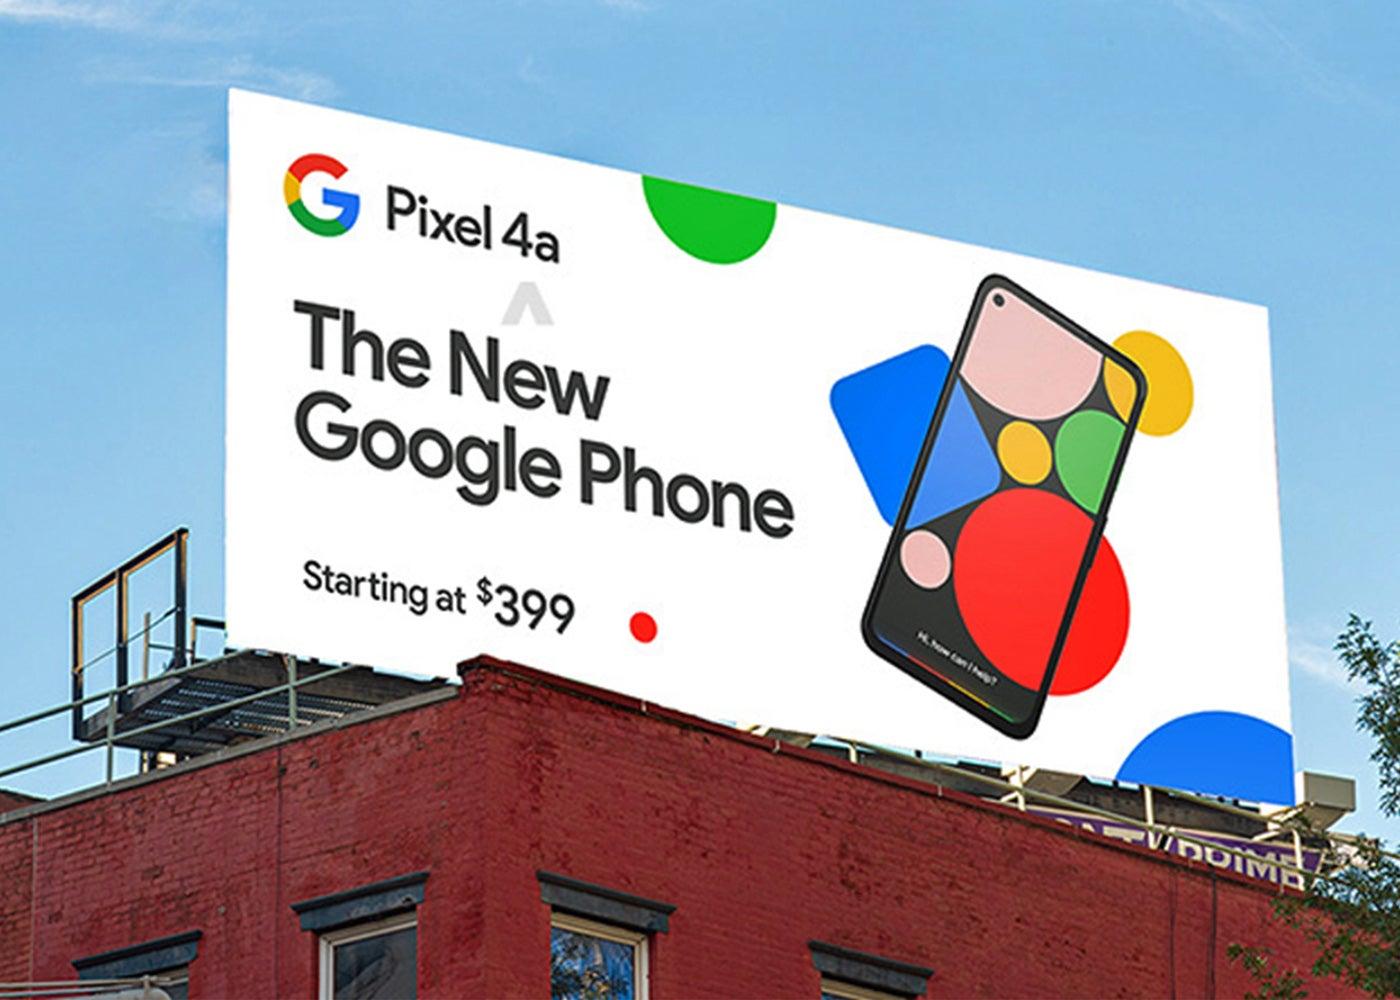 Google Pixel 4a, price